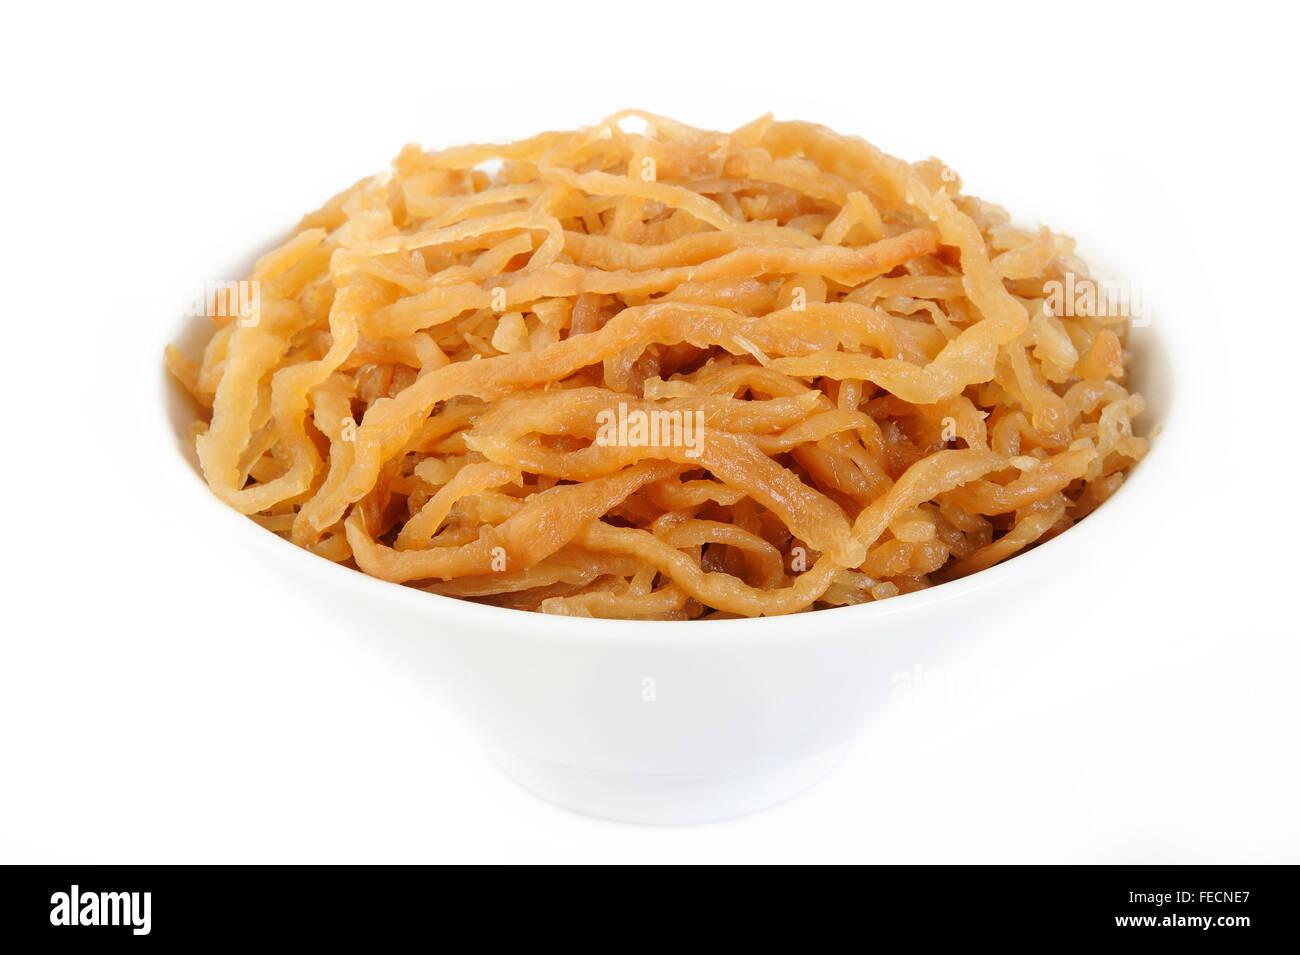 Pickle turnip in bowl - Stock Image